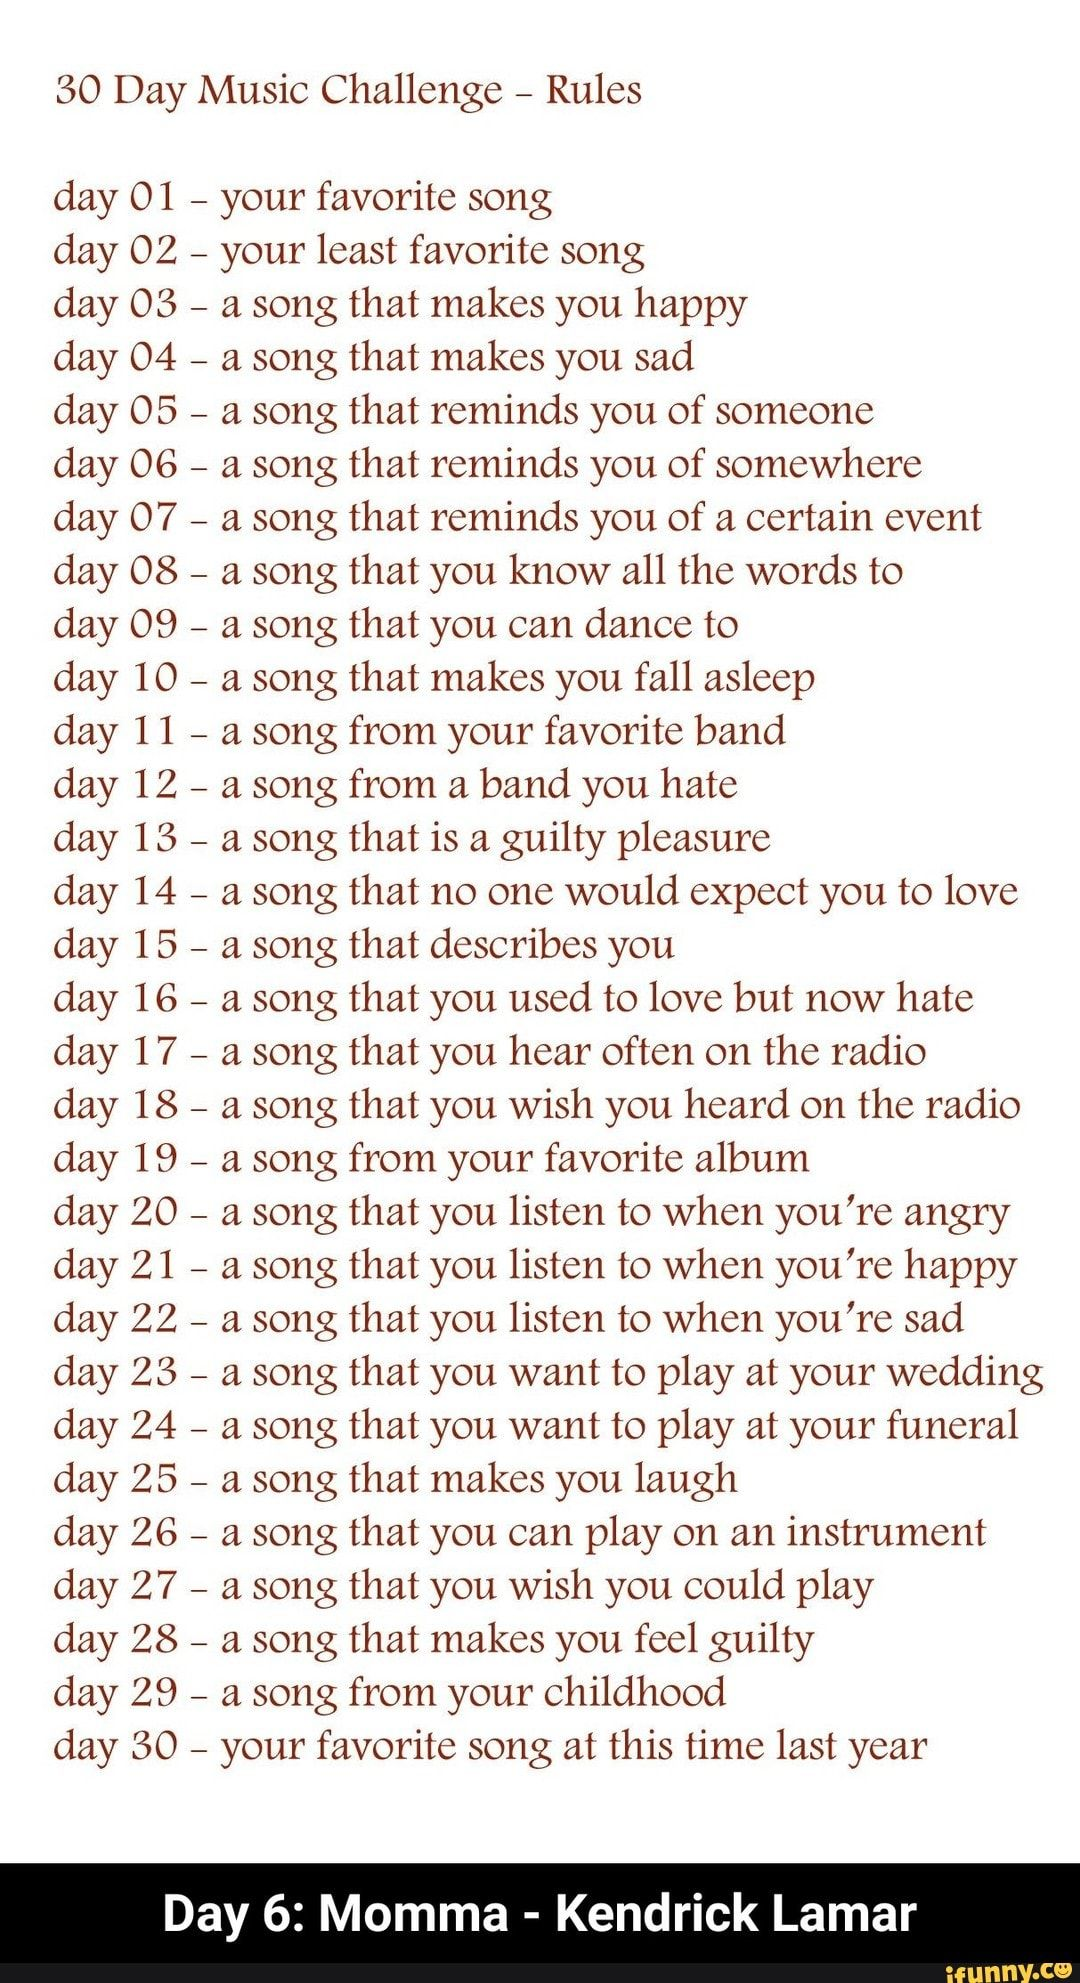 Day 6 Momma Kendrick Lamar Ifunny Music Challenge Kendrick Lamar 30 Day Music Challenge